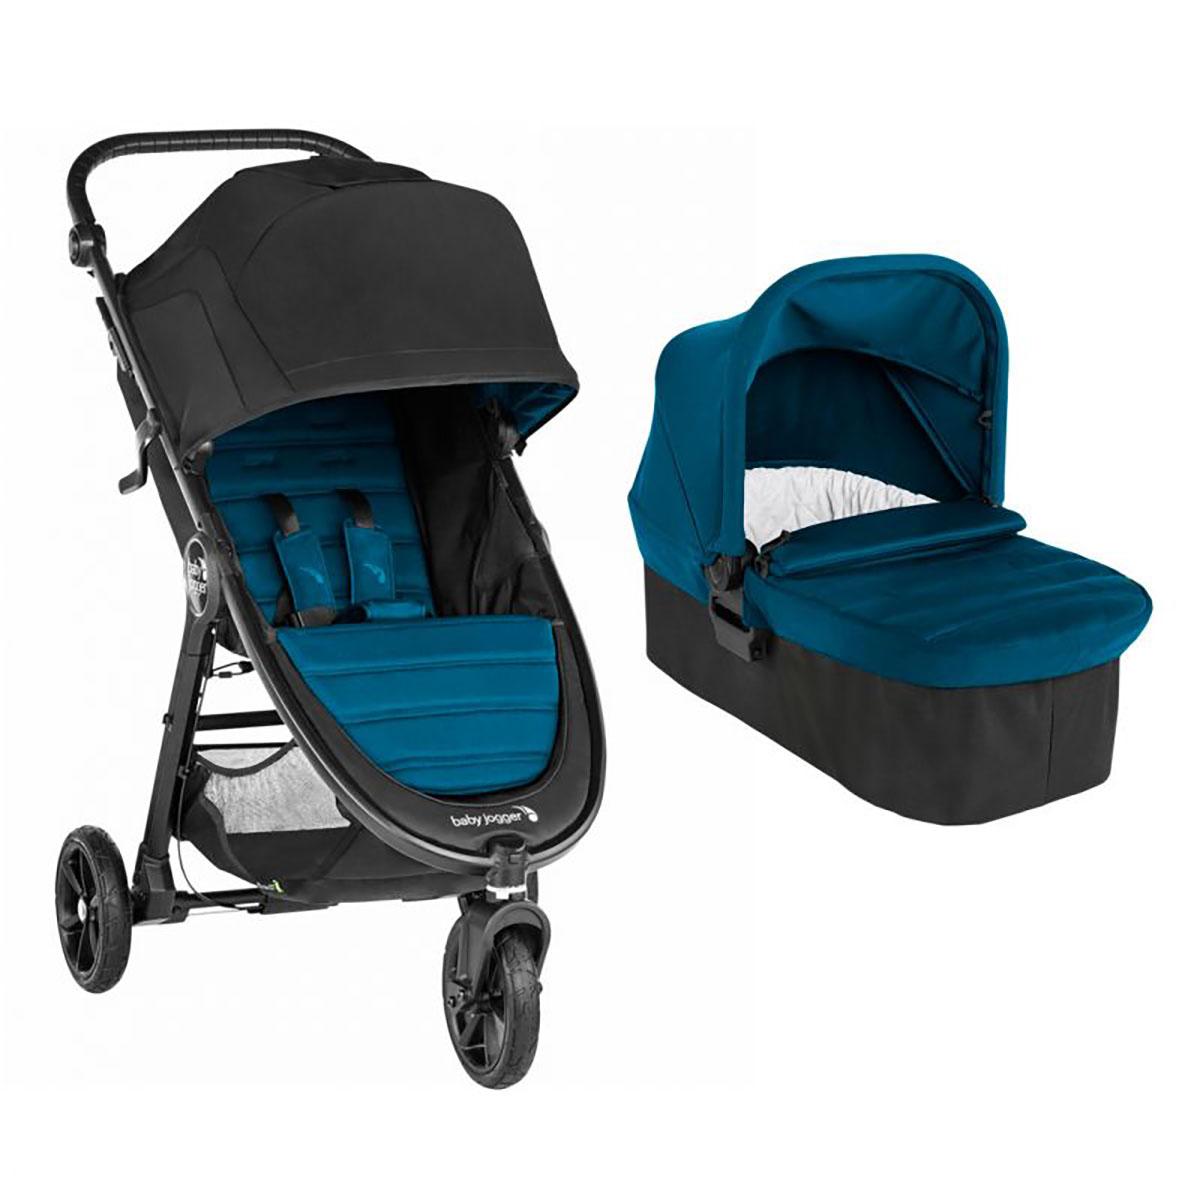 Carucior Baby Jogger City Mini Gt 2 Mystic, Sistem 2 In 1